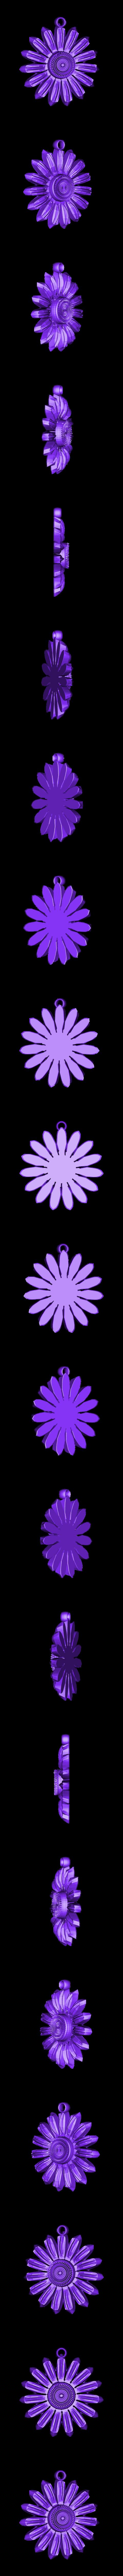 sunflower.stl Download free STL file Sunflower • 3D print design, koukwst